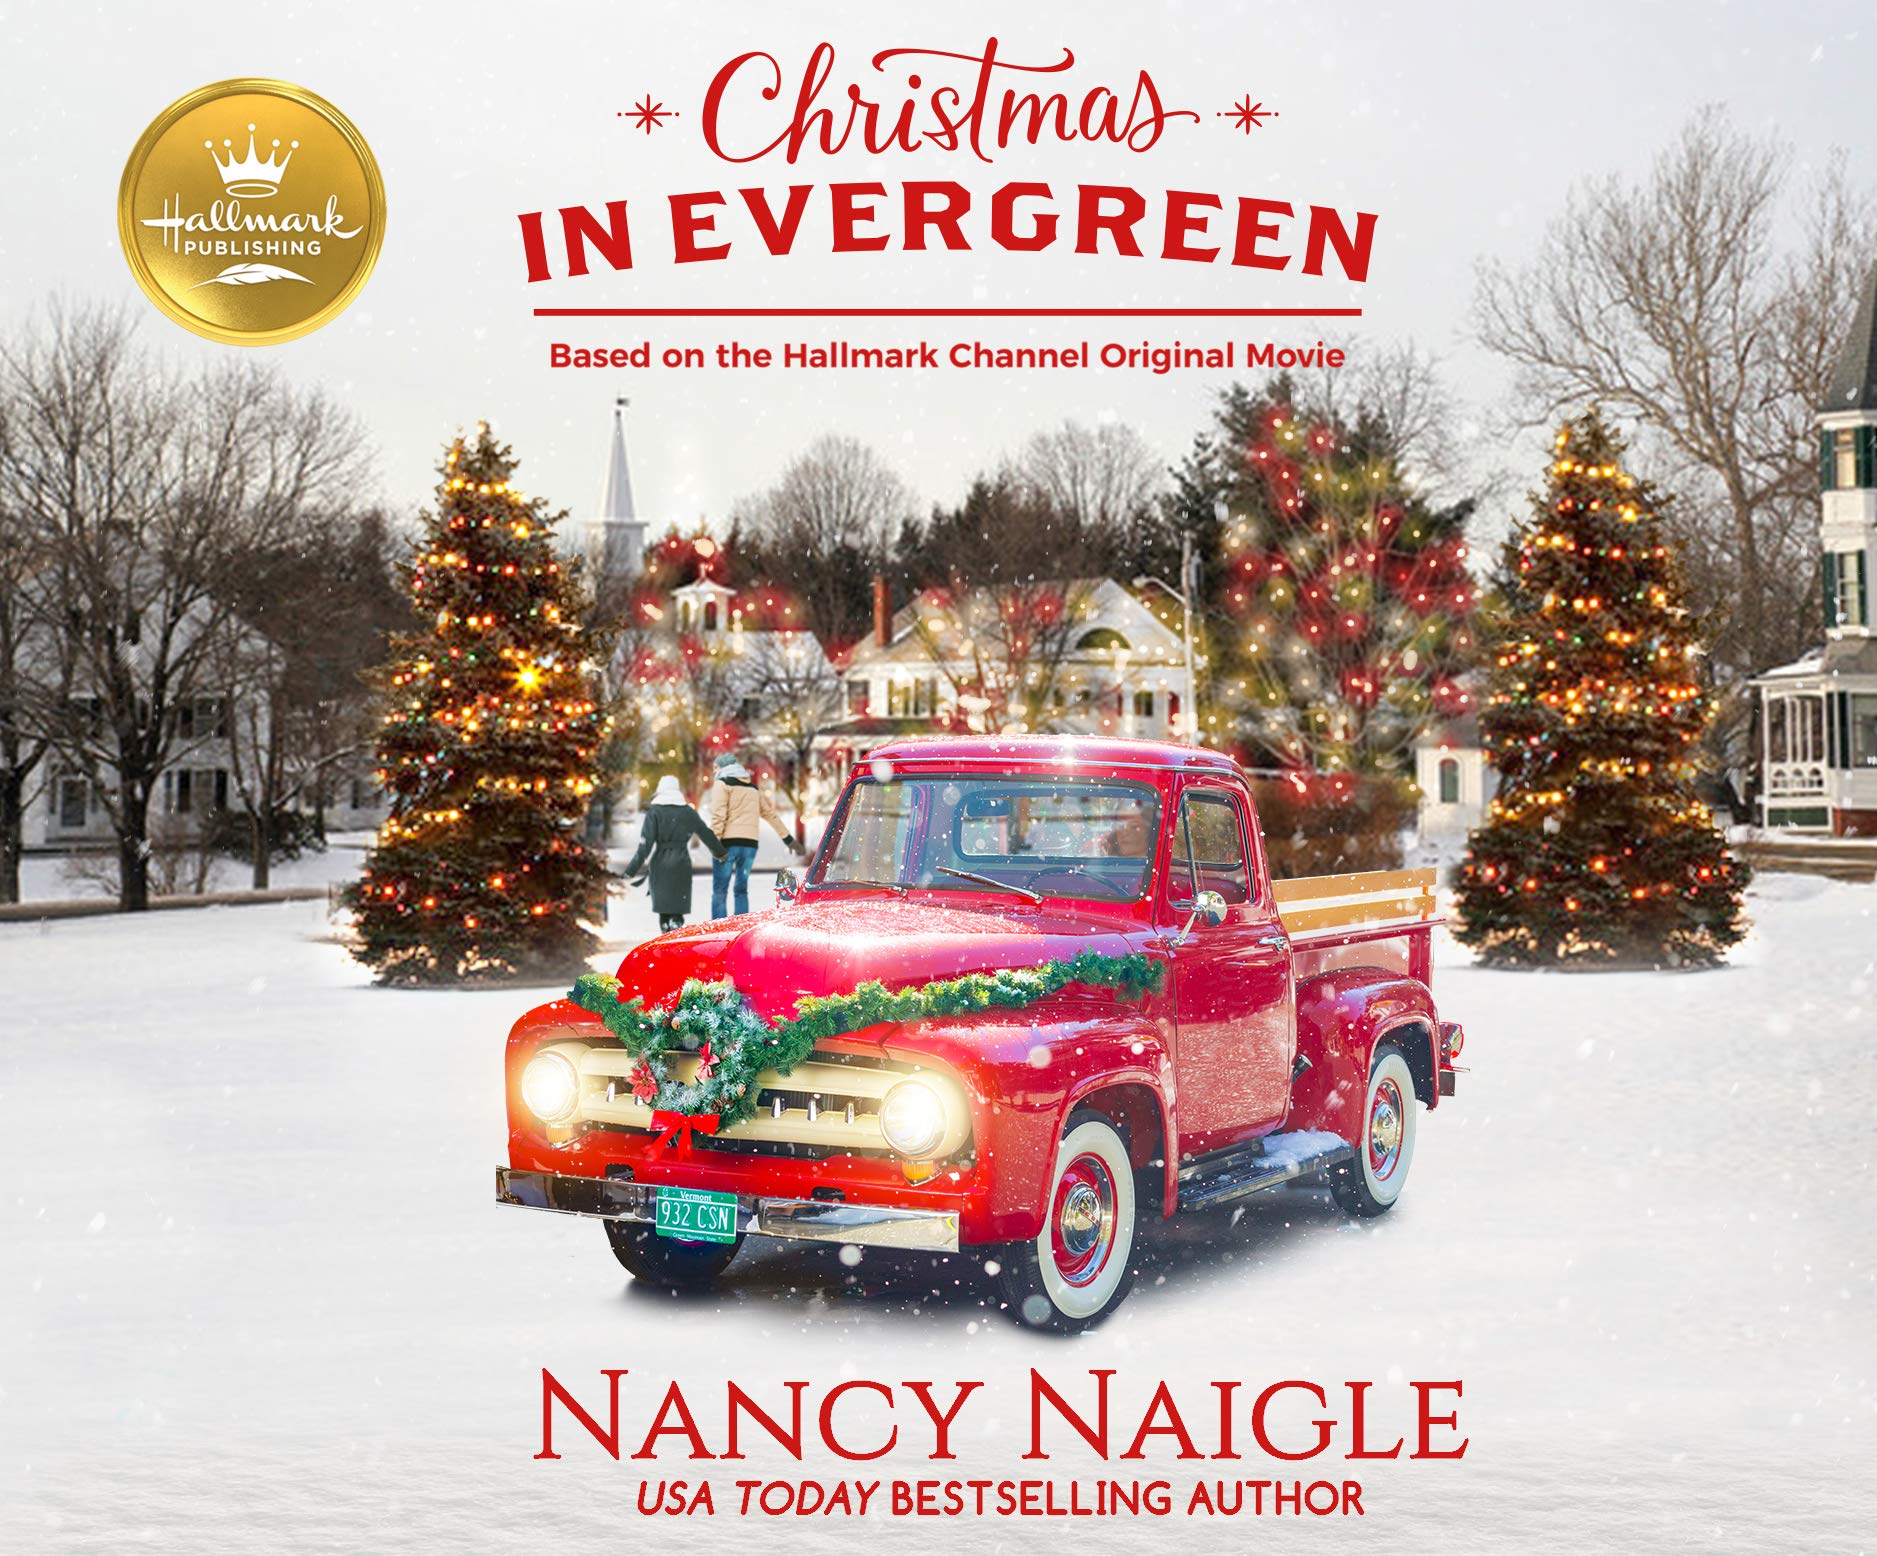 Christmas In Evergreen Truck.Amazon Com Christmas In Evergreen Based On The Hallmark